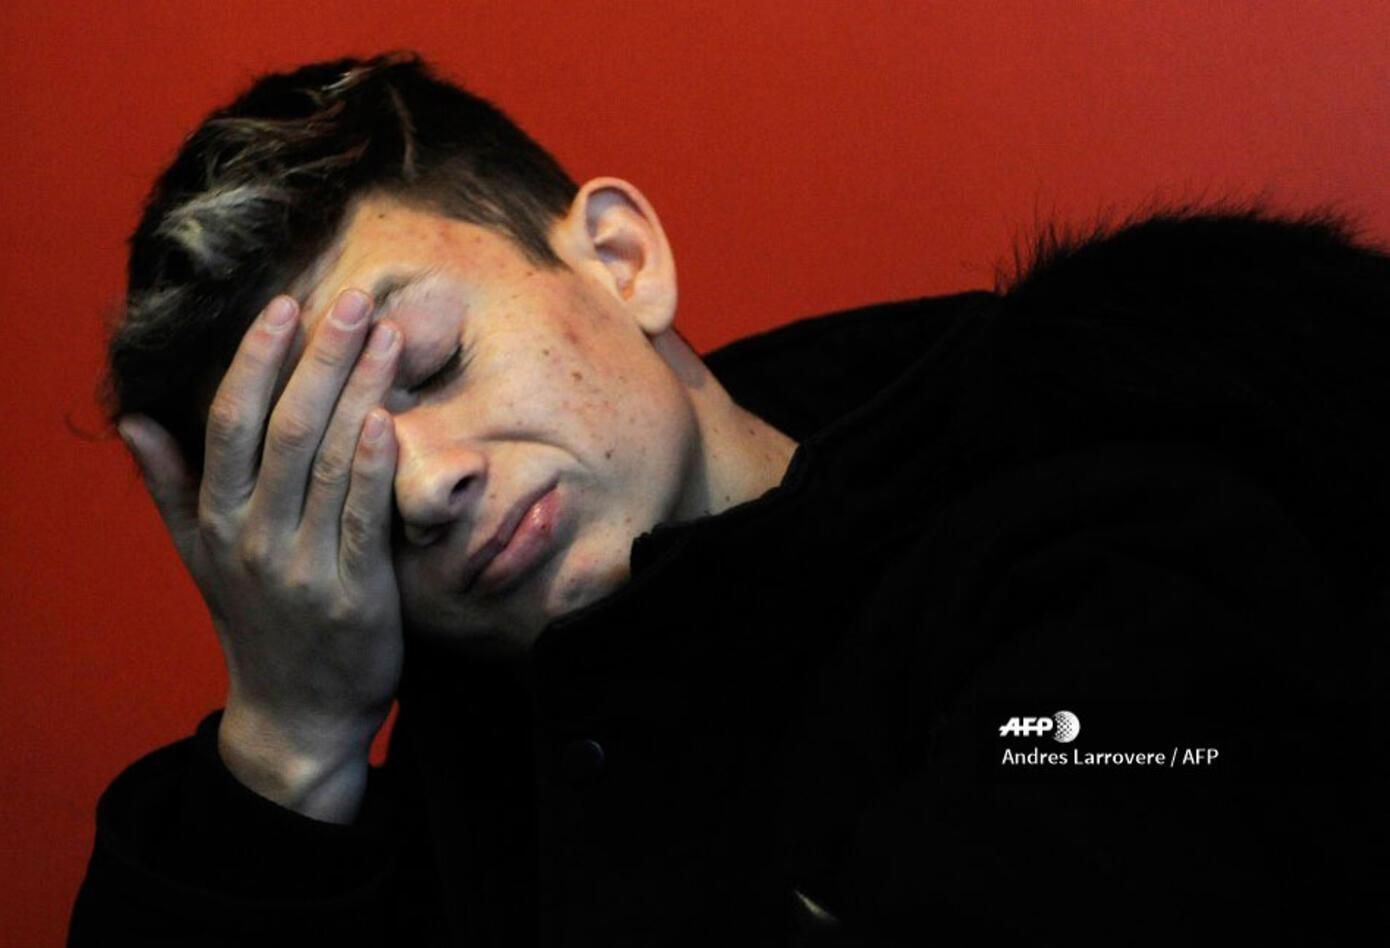 A sus 18 años, Ezequiel Villalonga descree de la Iglesia católica.